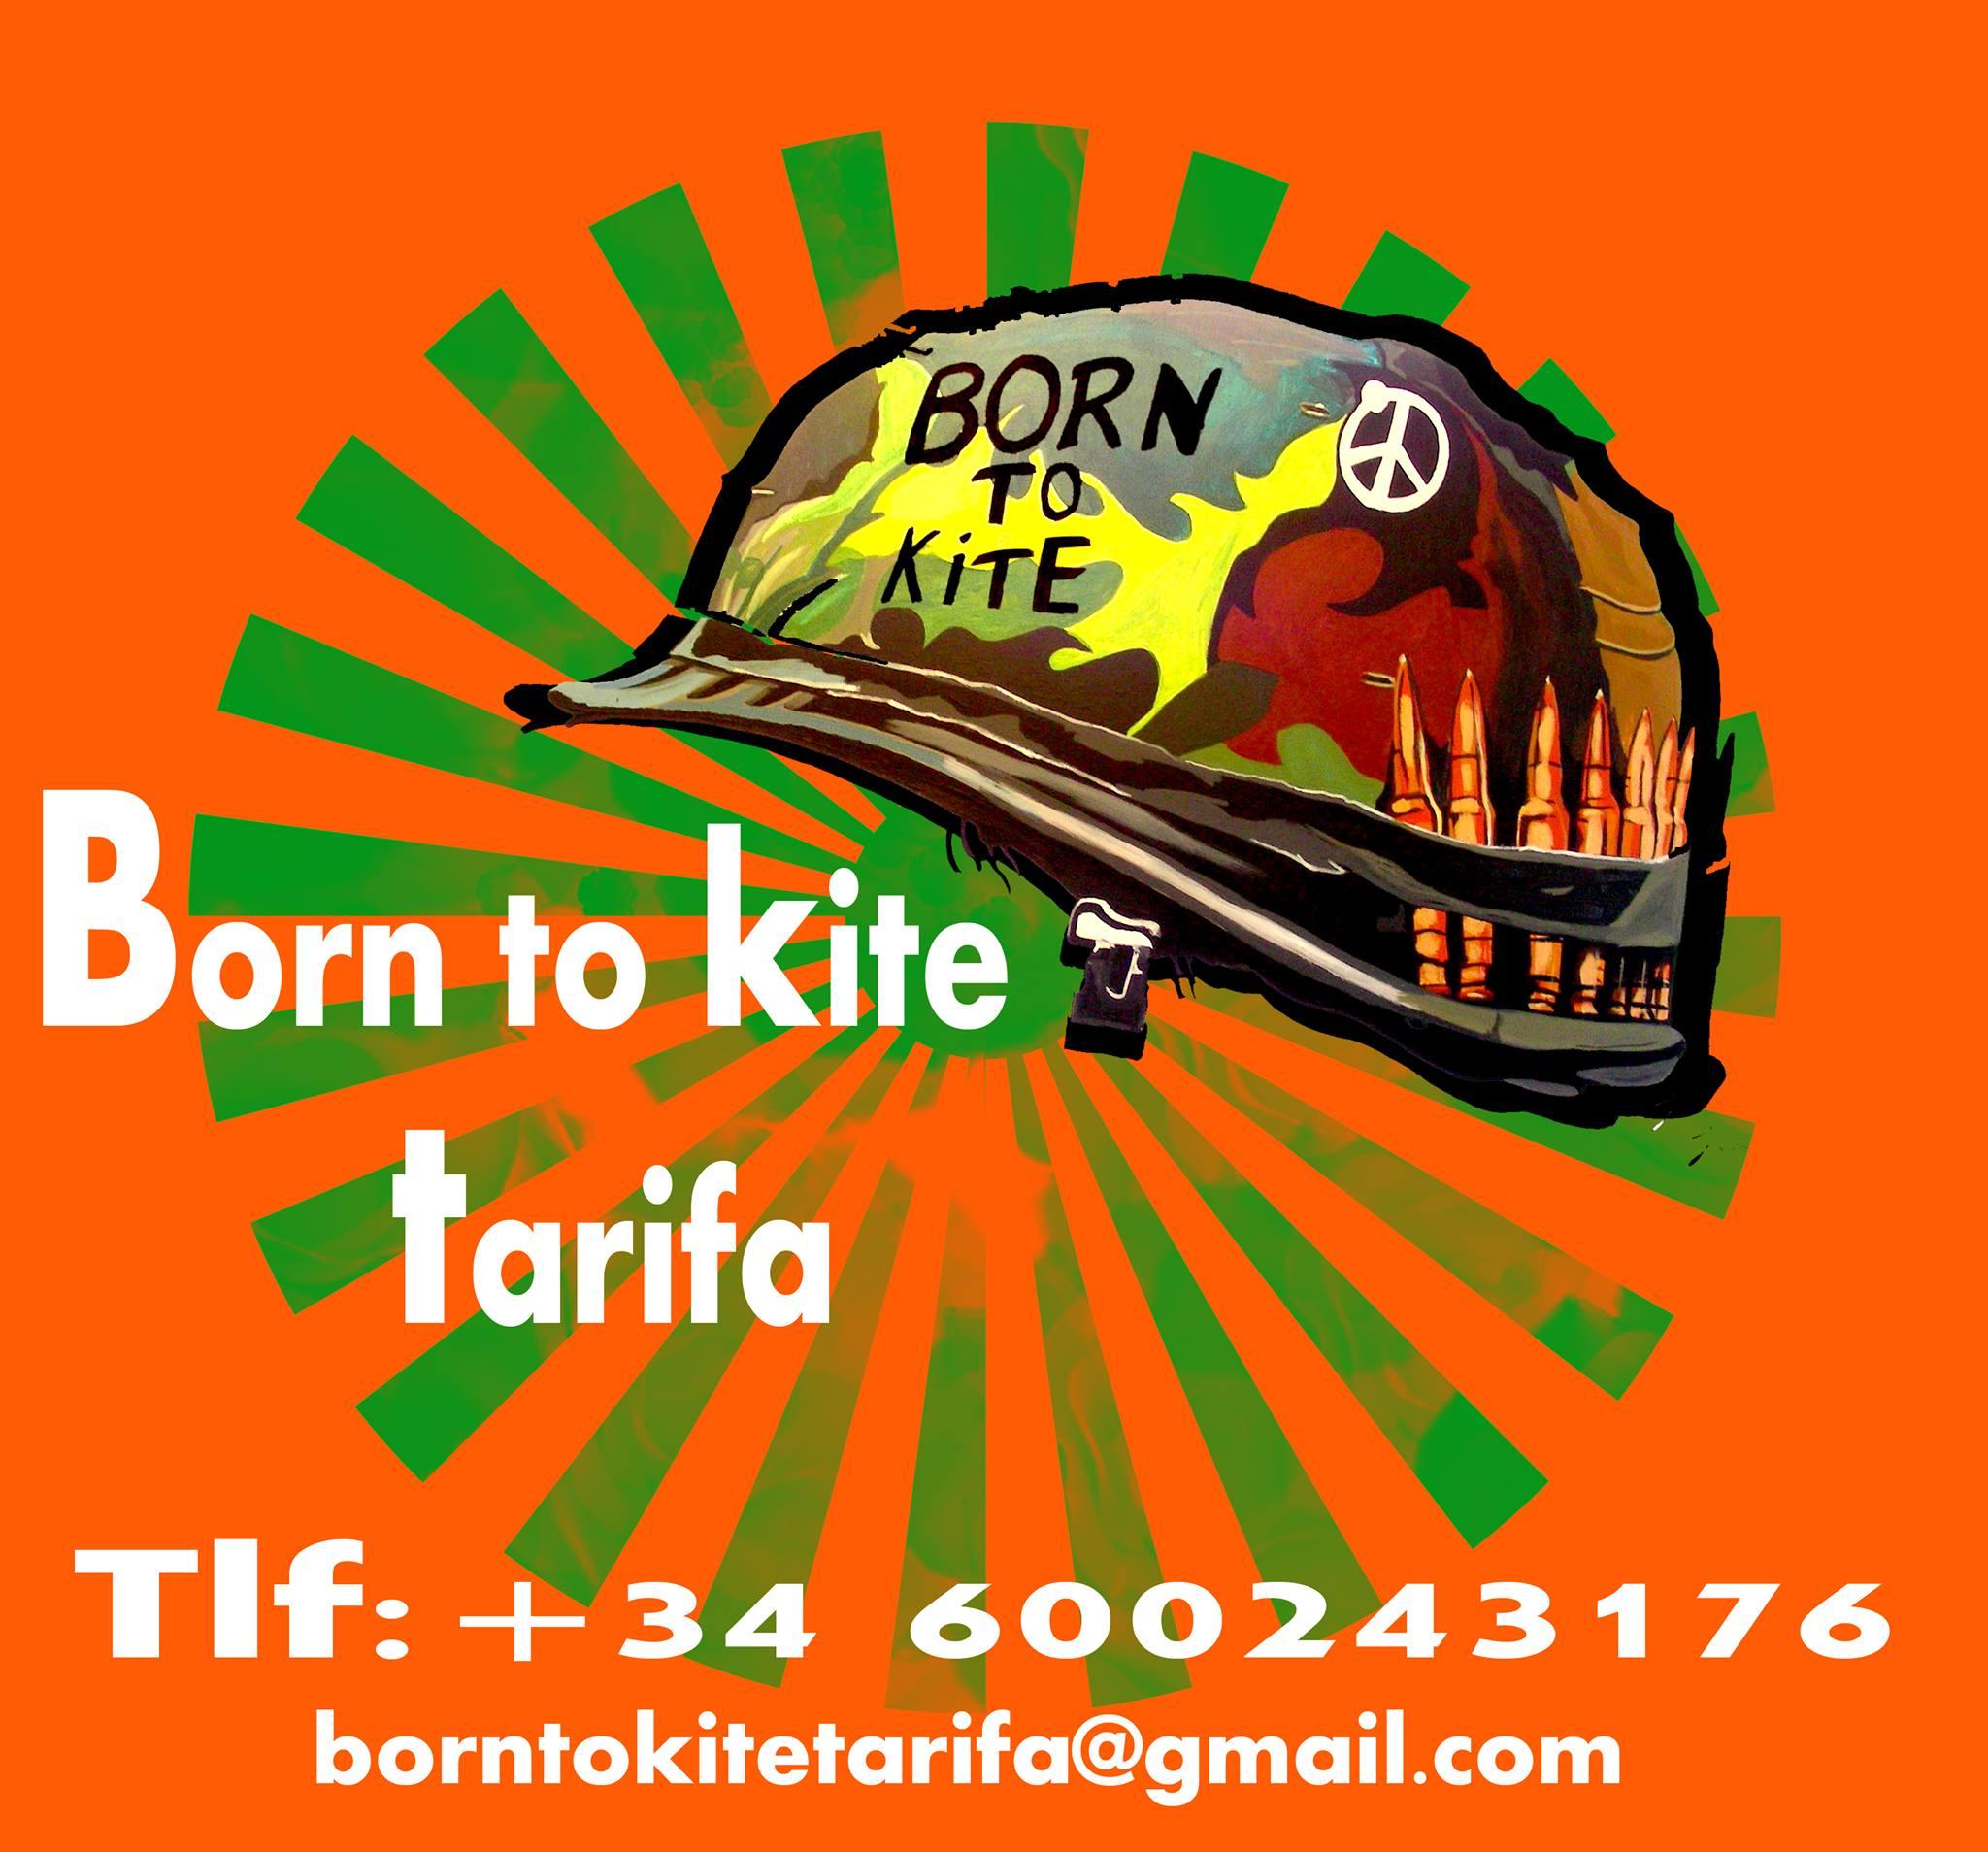 Born to Kite Tarifa